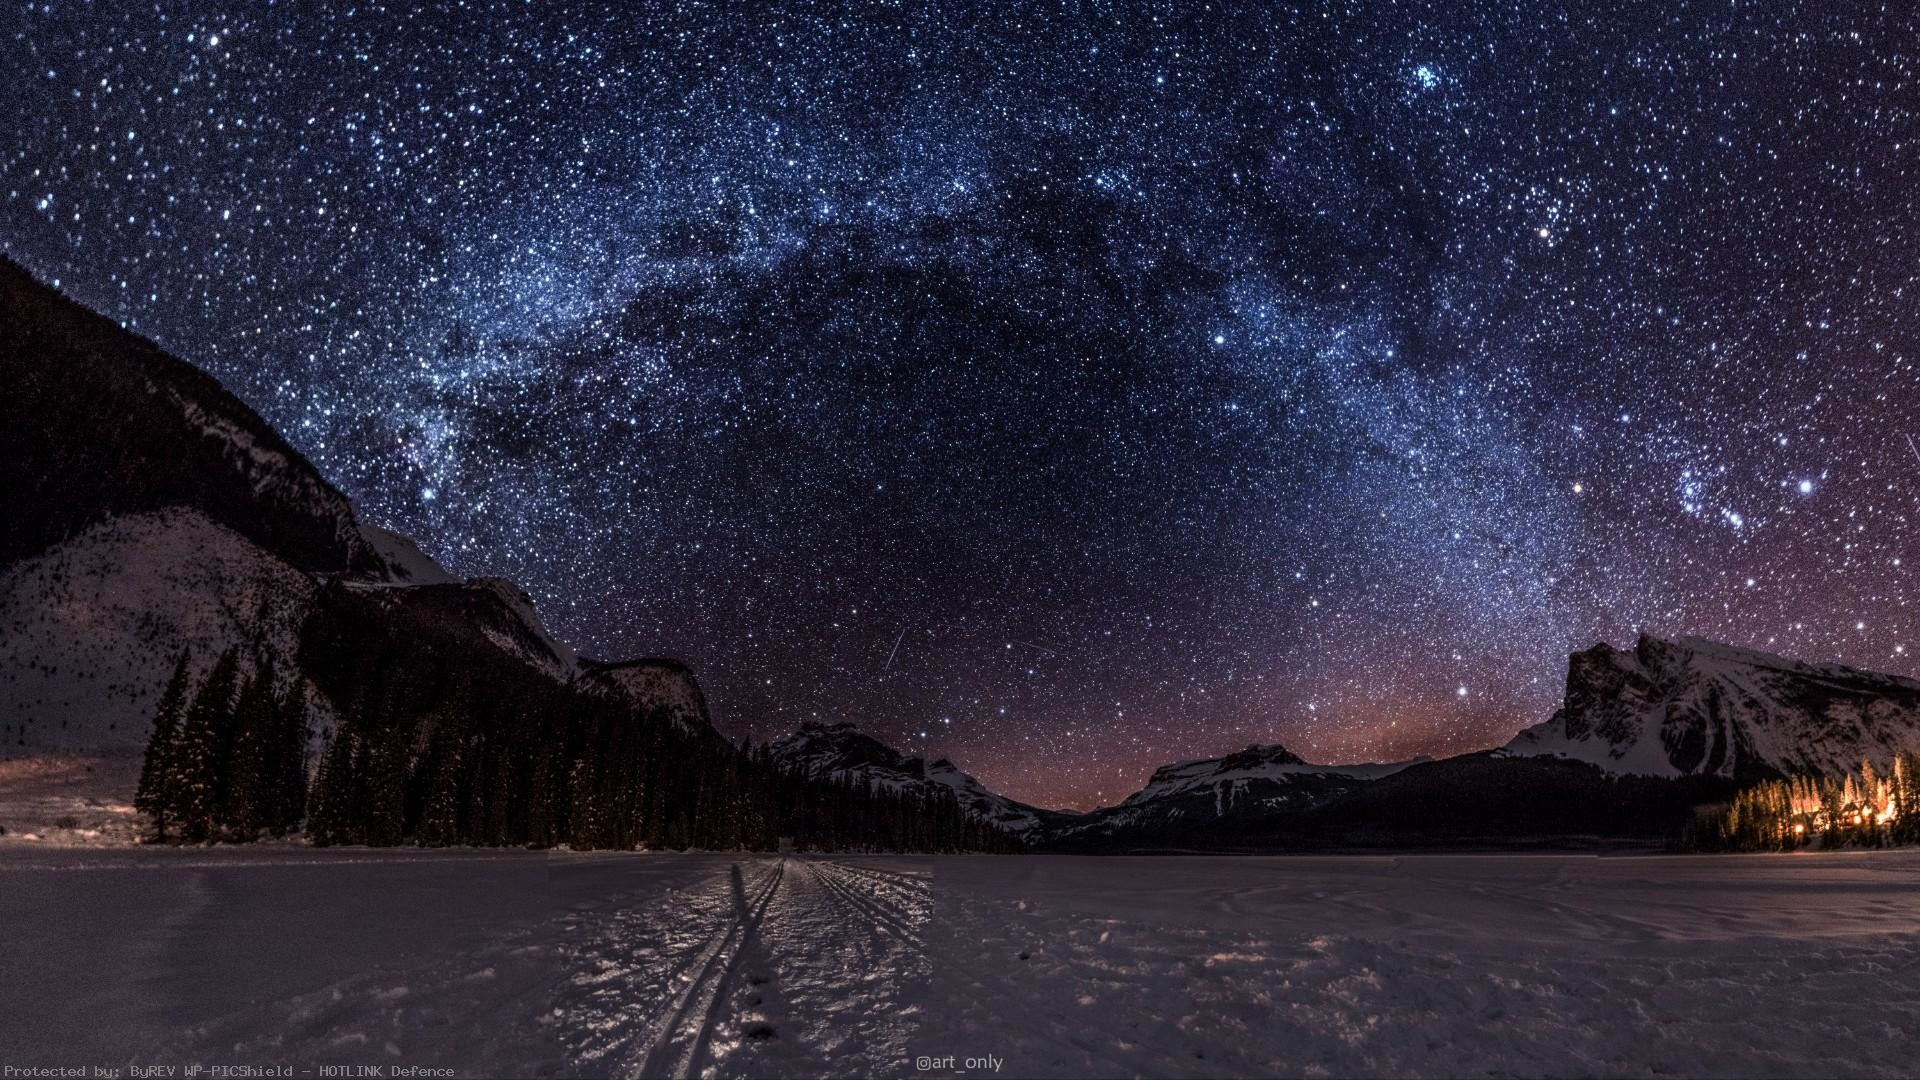 The-night-sky-at-Emerald-Lake-BC-on-